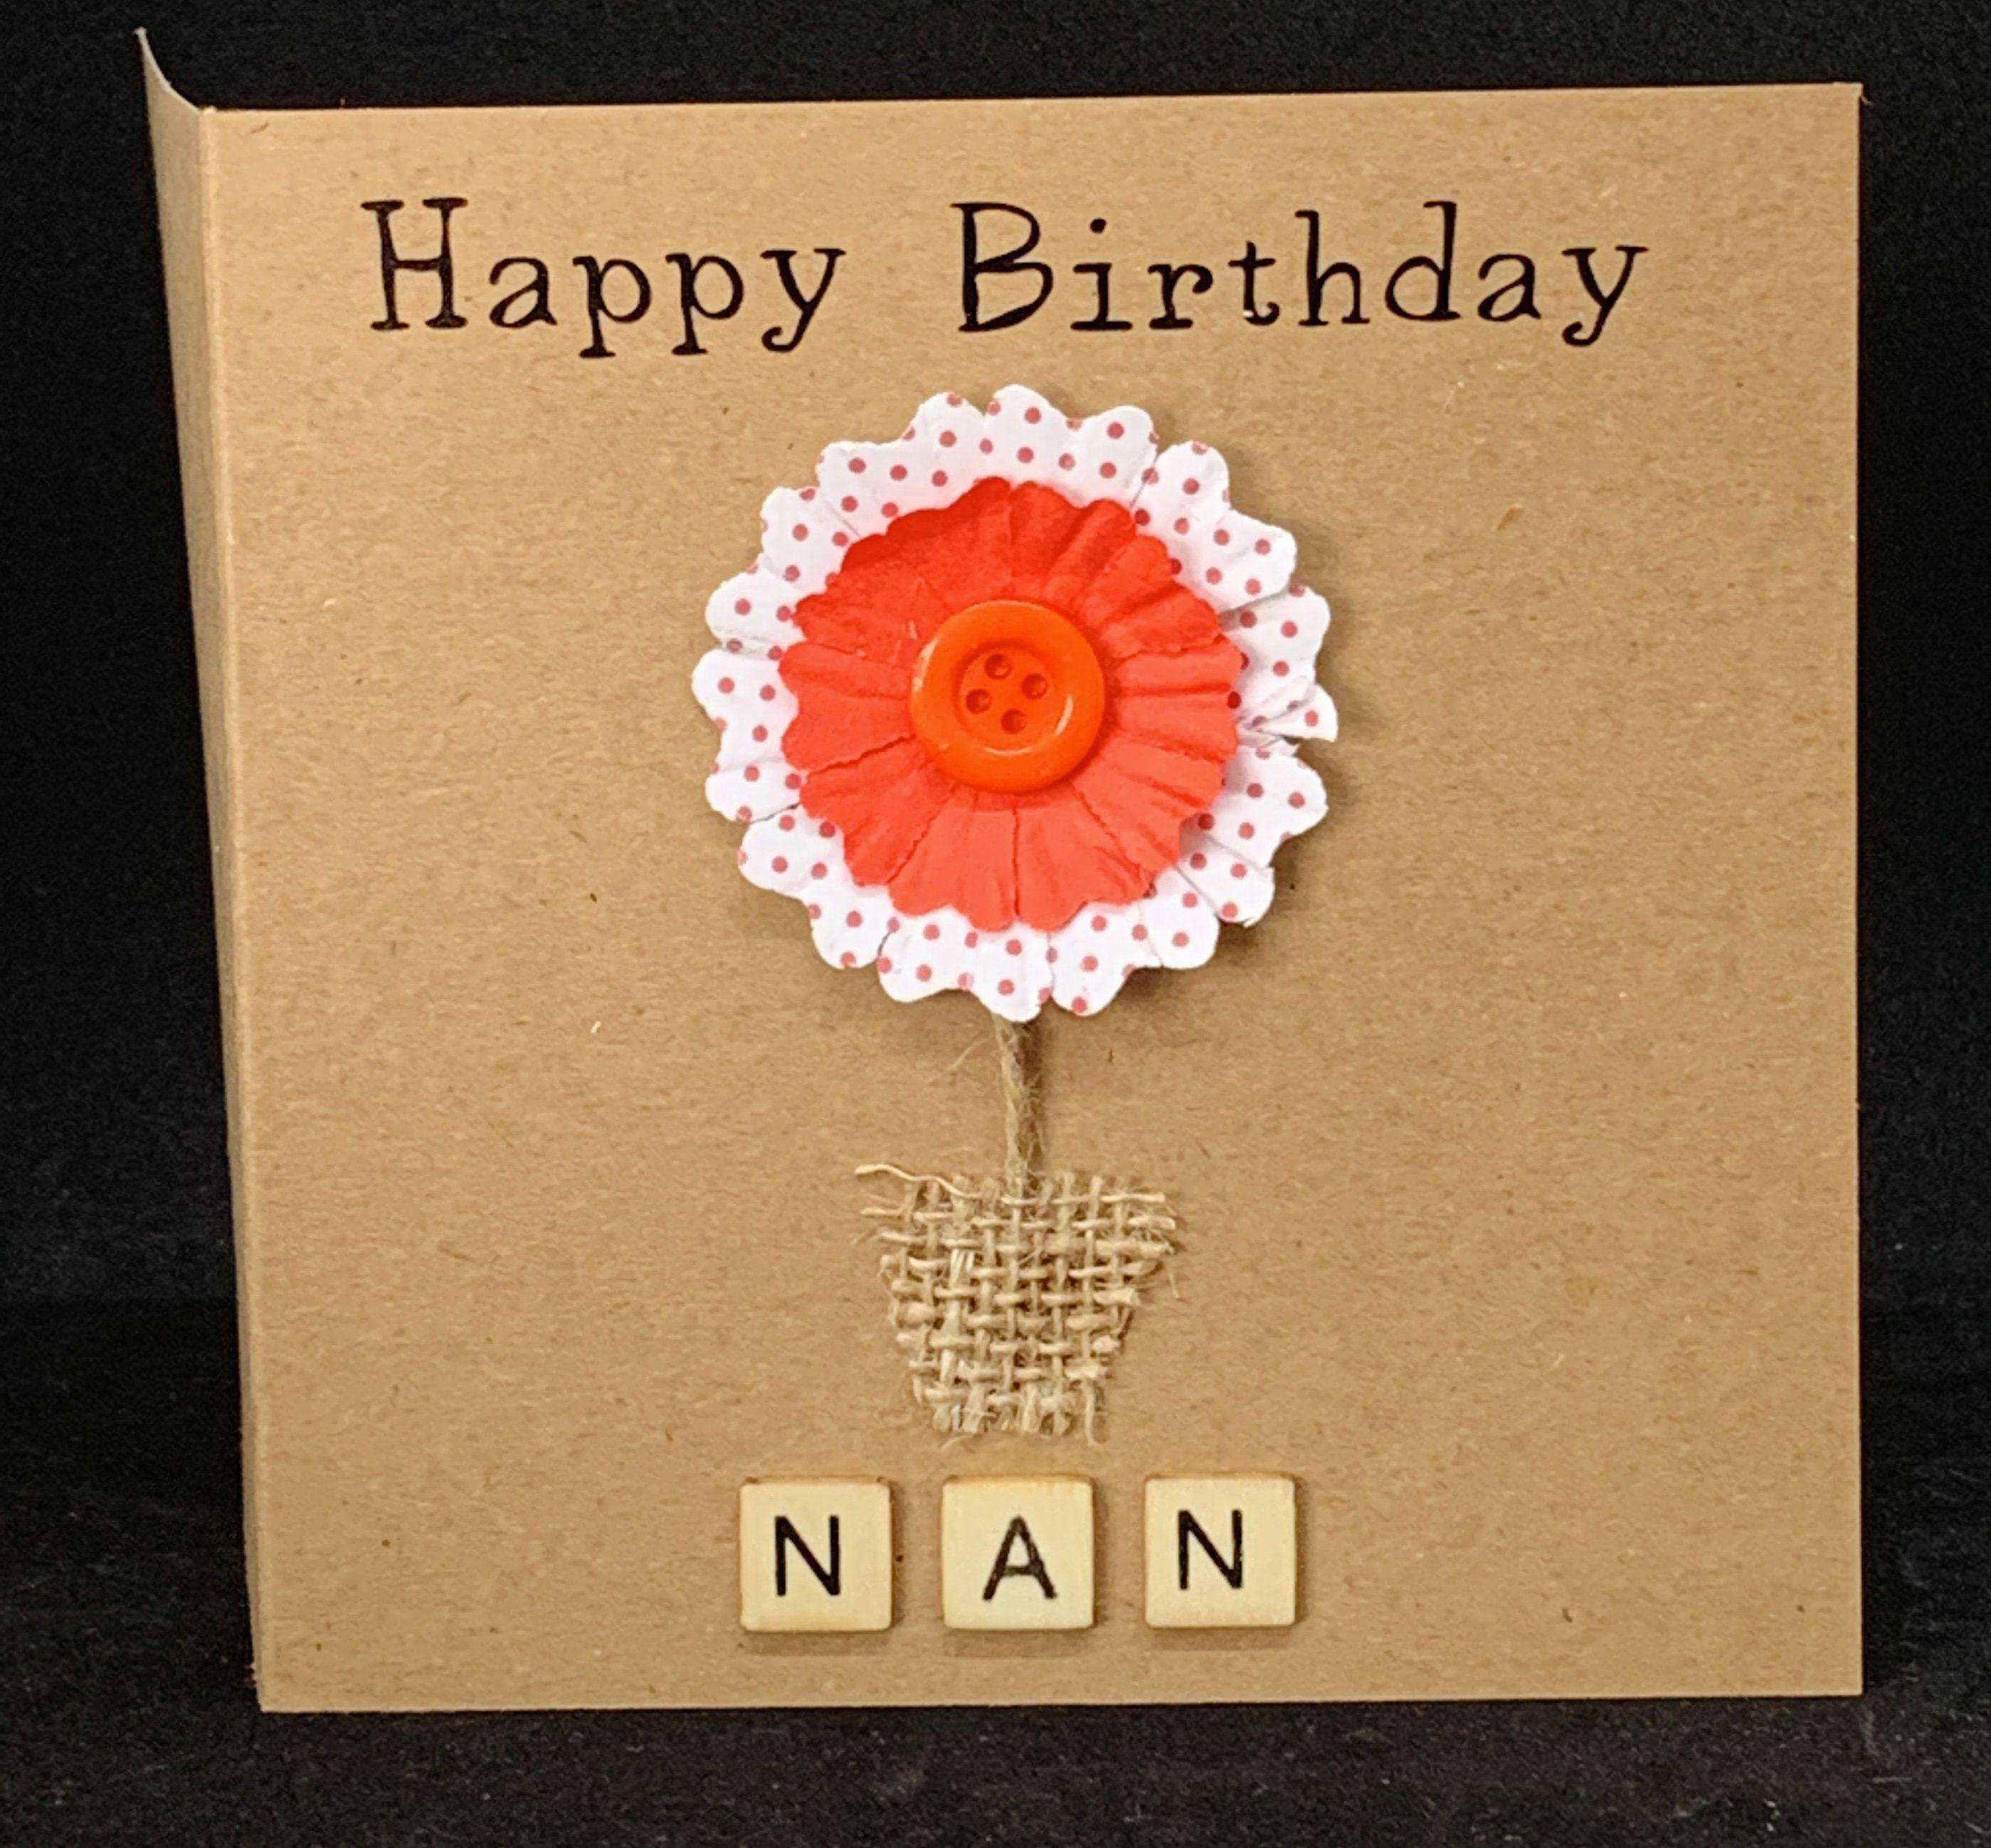 Happy Birthday Nan Personalised Birthday Card For Nan Card Etsy Personalized Birthday Cards Birthday Cards 30th Birthday Cards